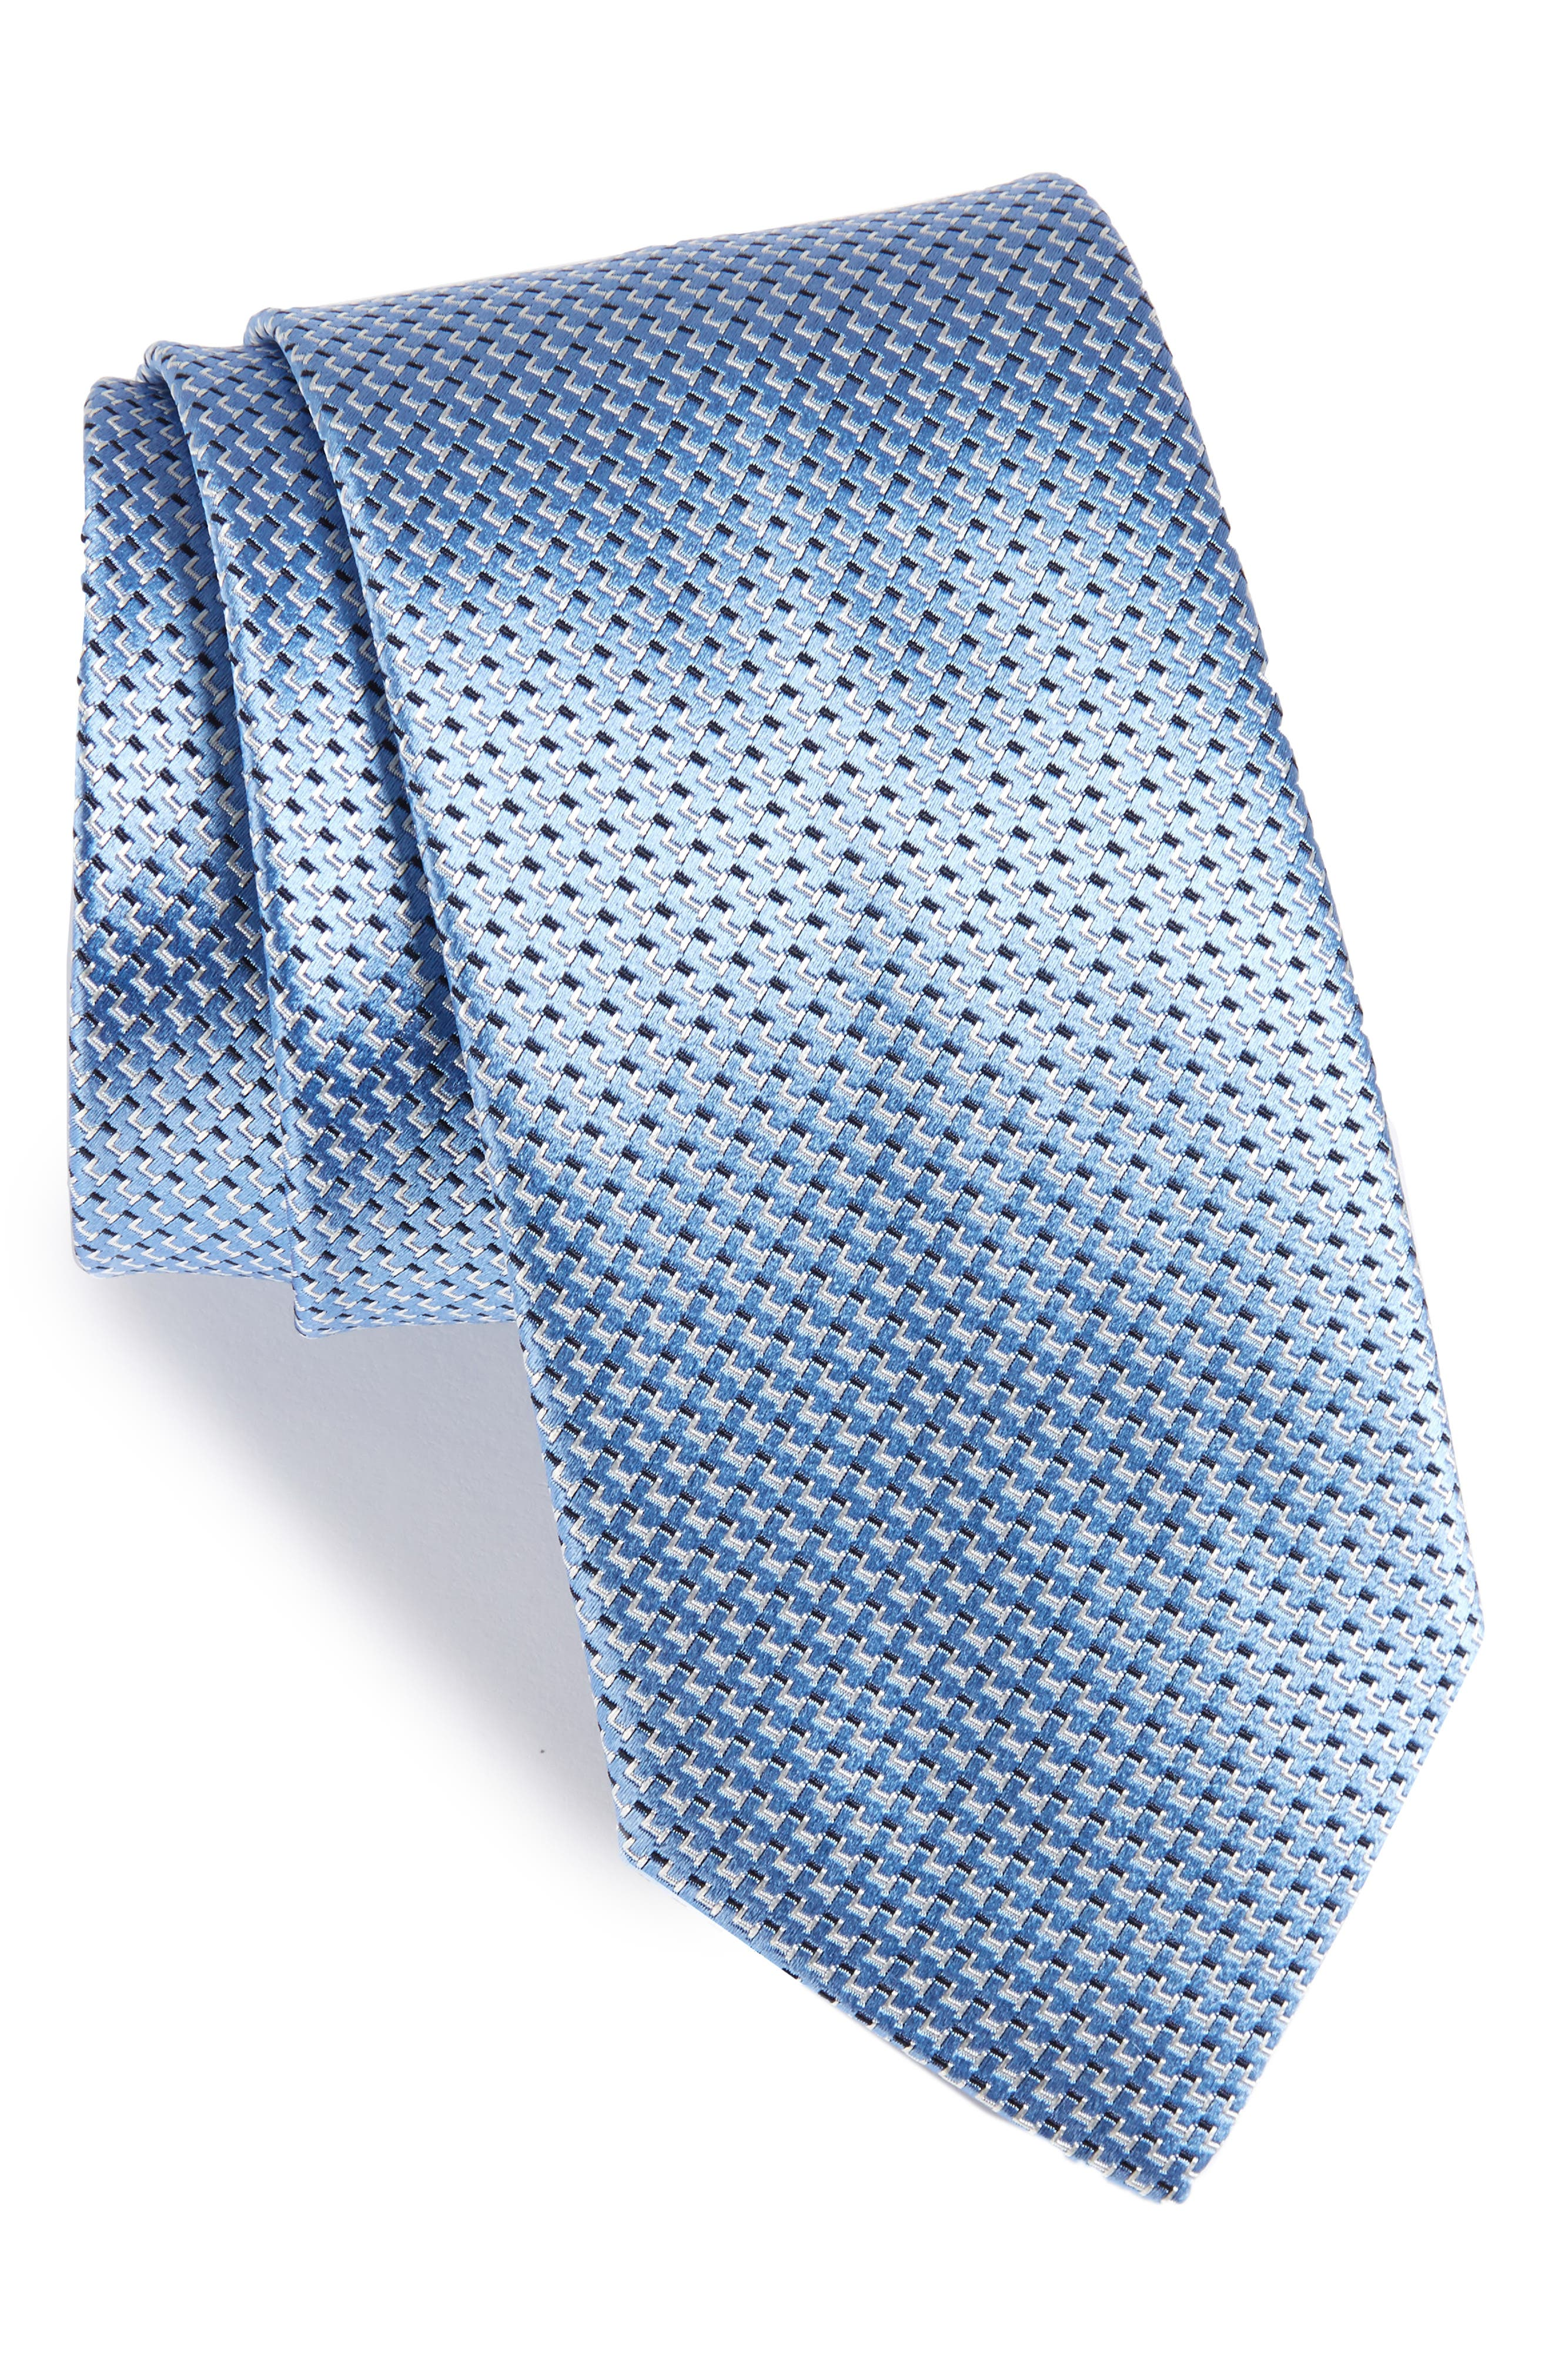 Solid Silk Tie,                             Main thumbnail 1, color,                             Light Blue